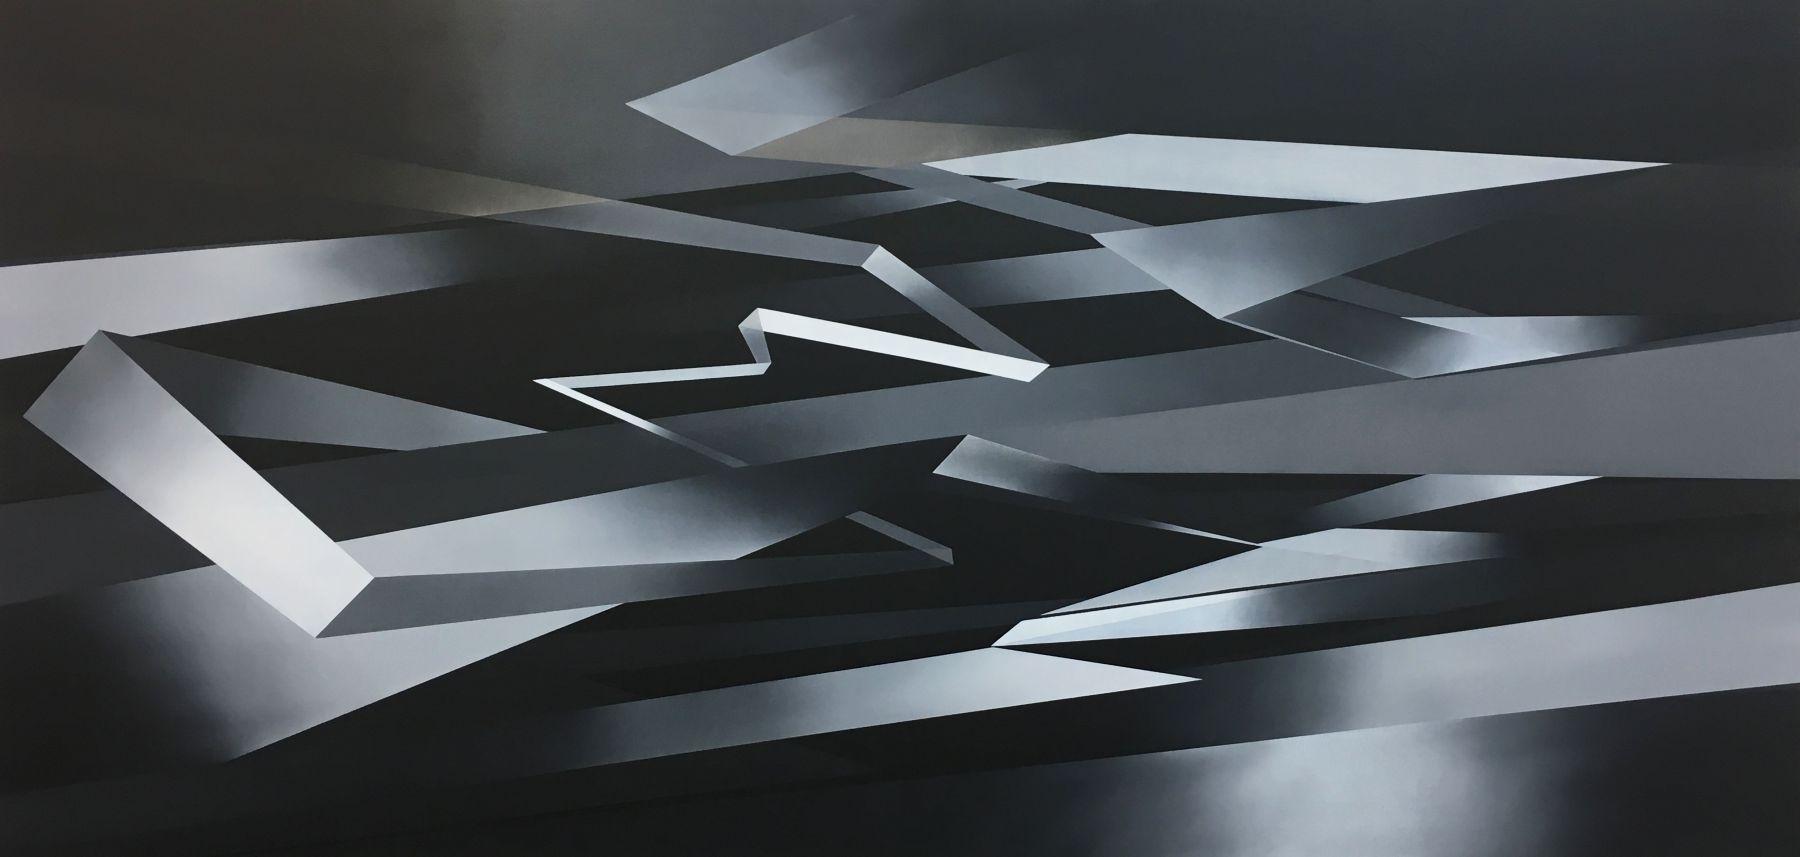 MARNA SHOPOFF, Noir, 2017